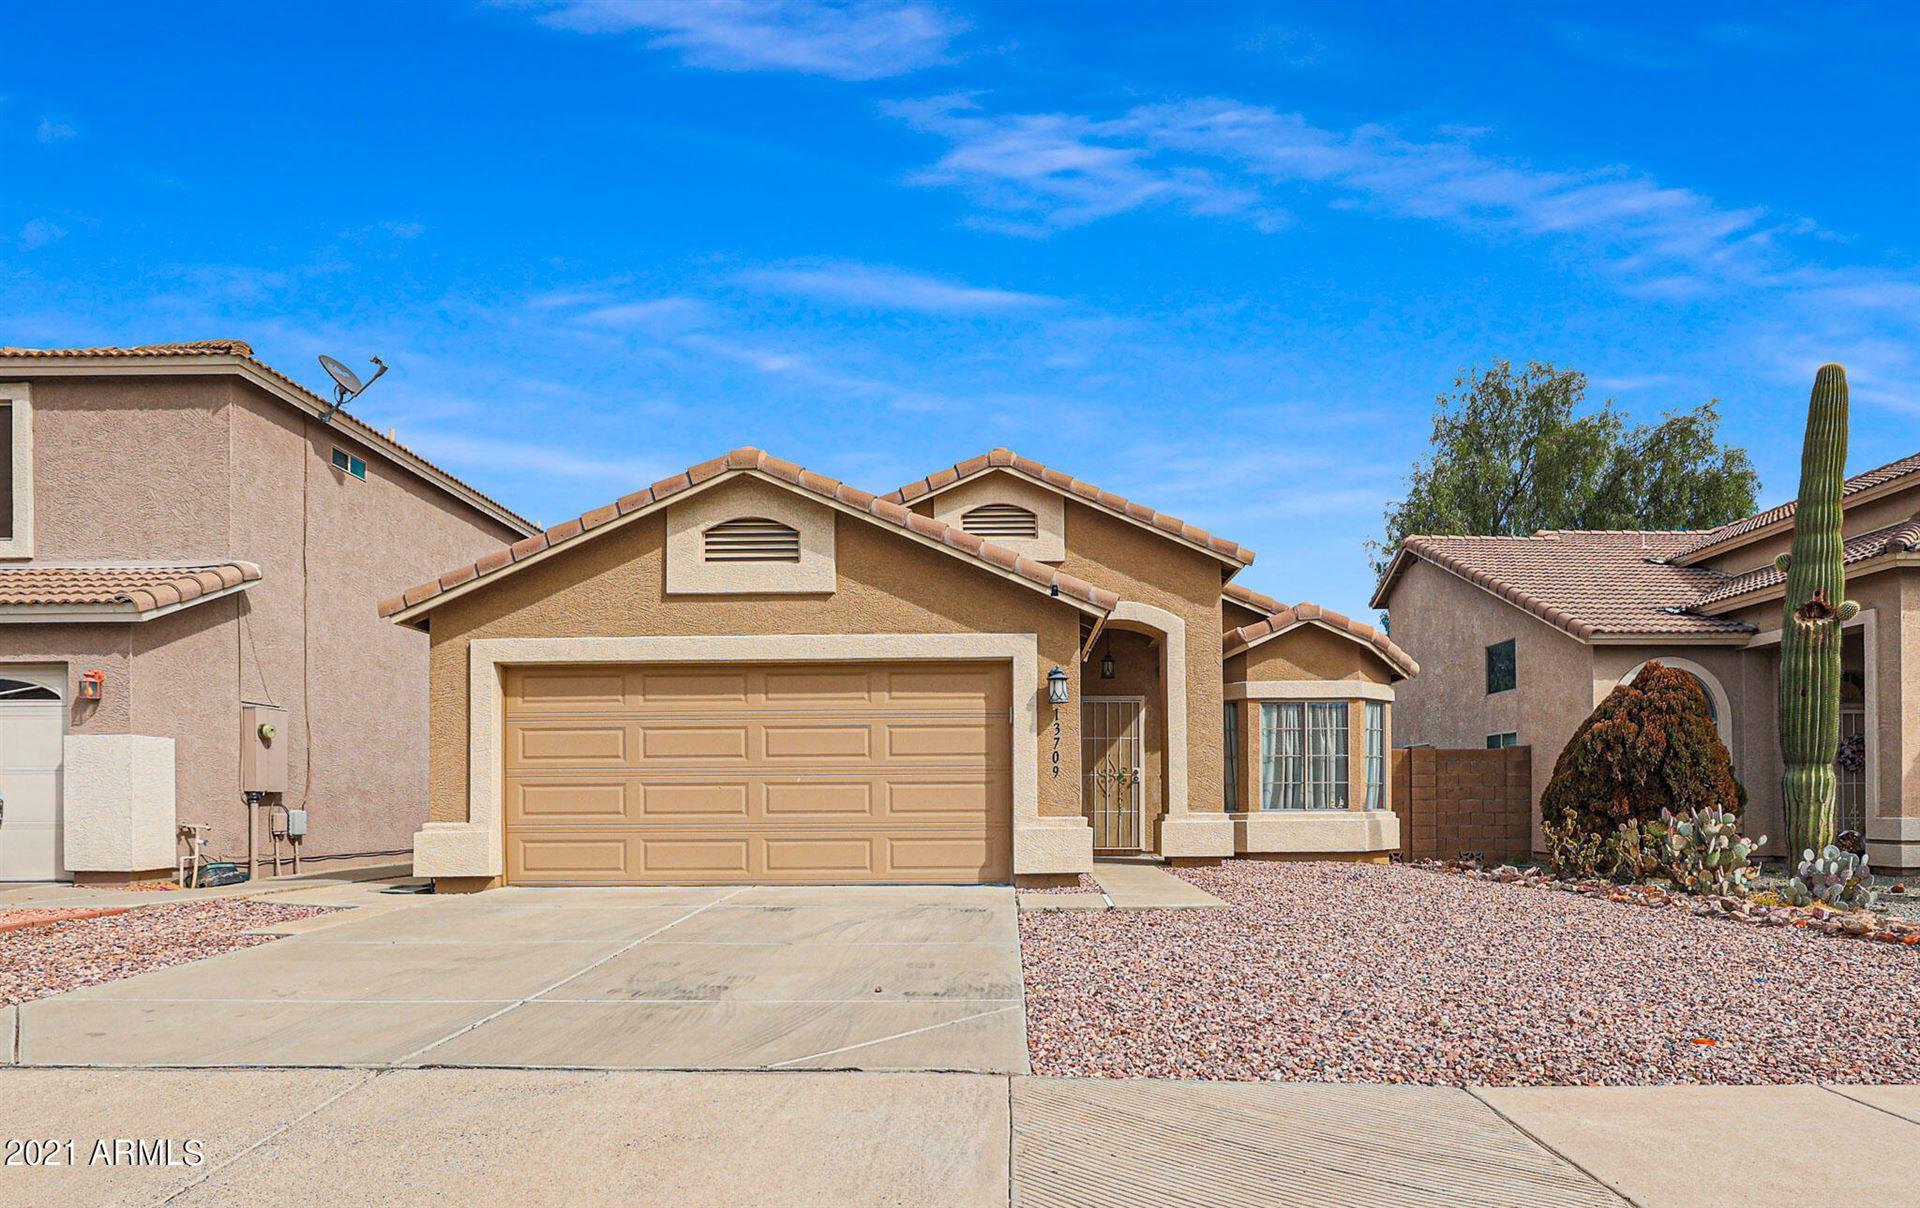 Photo of 13709 N 129TH Drive, El Mirage, AZ 85335 (MLS # 6305859)